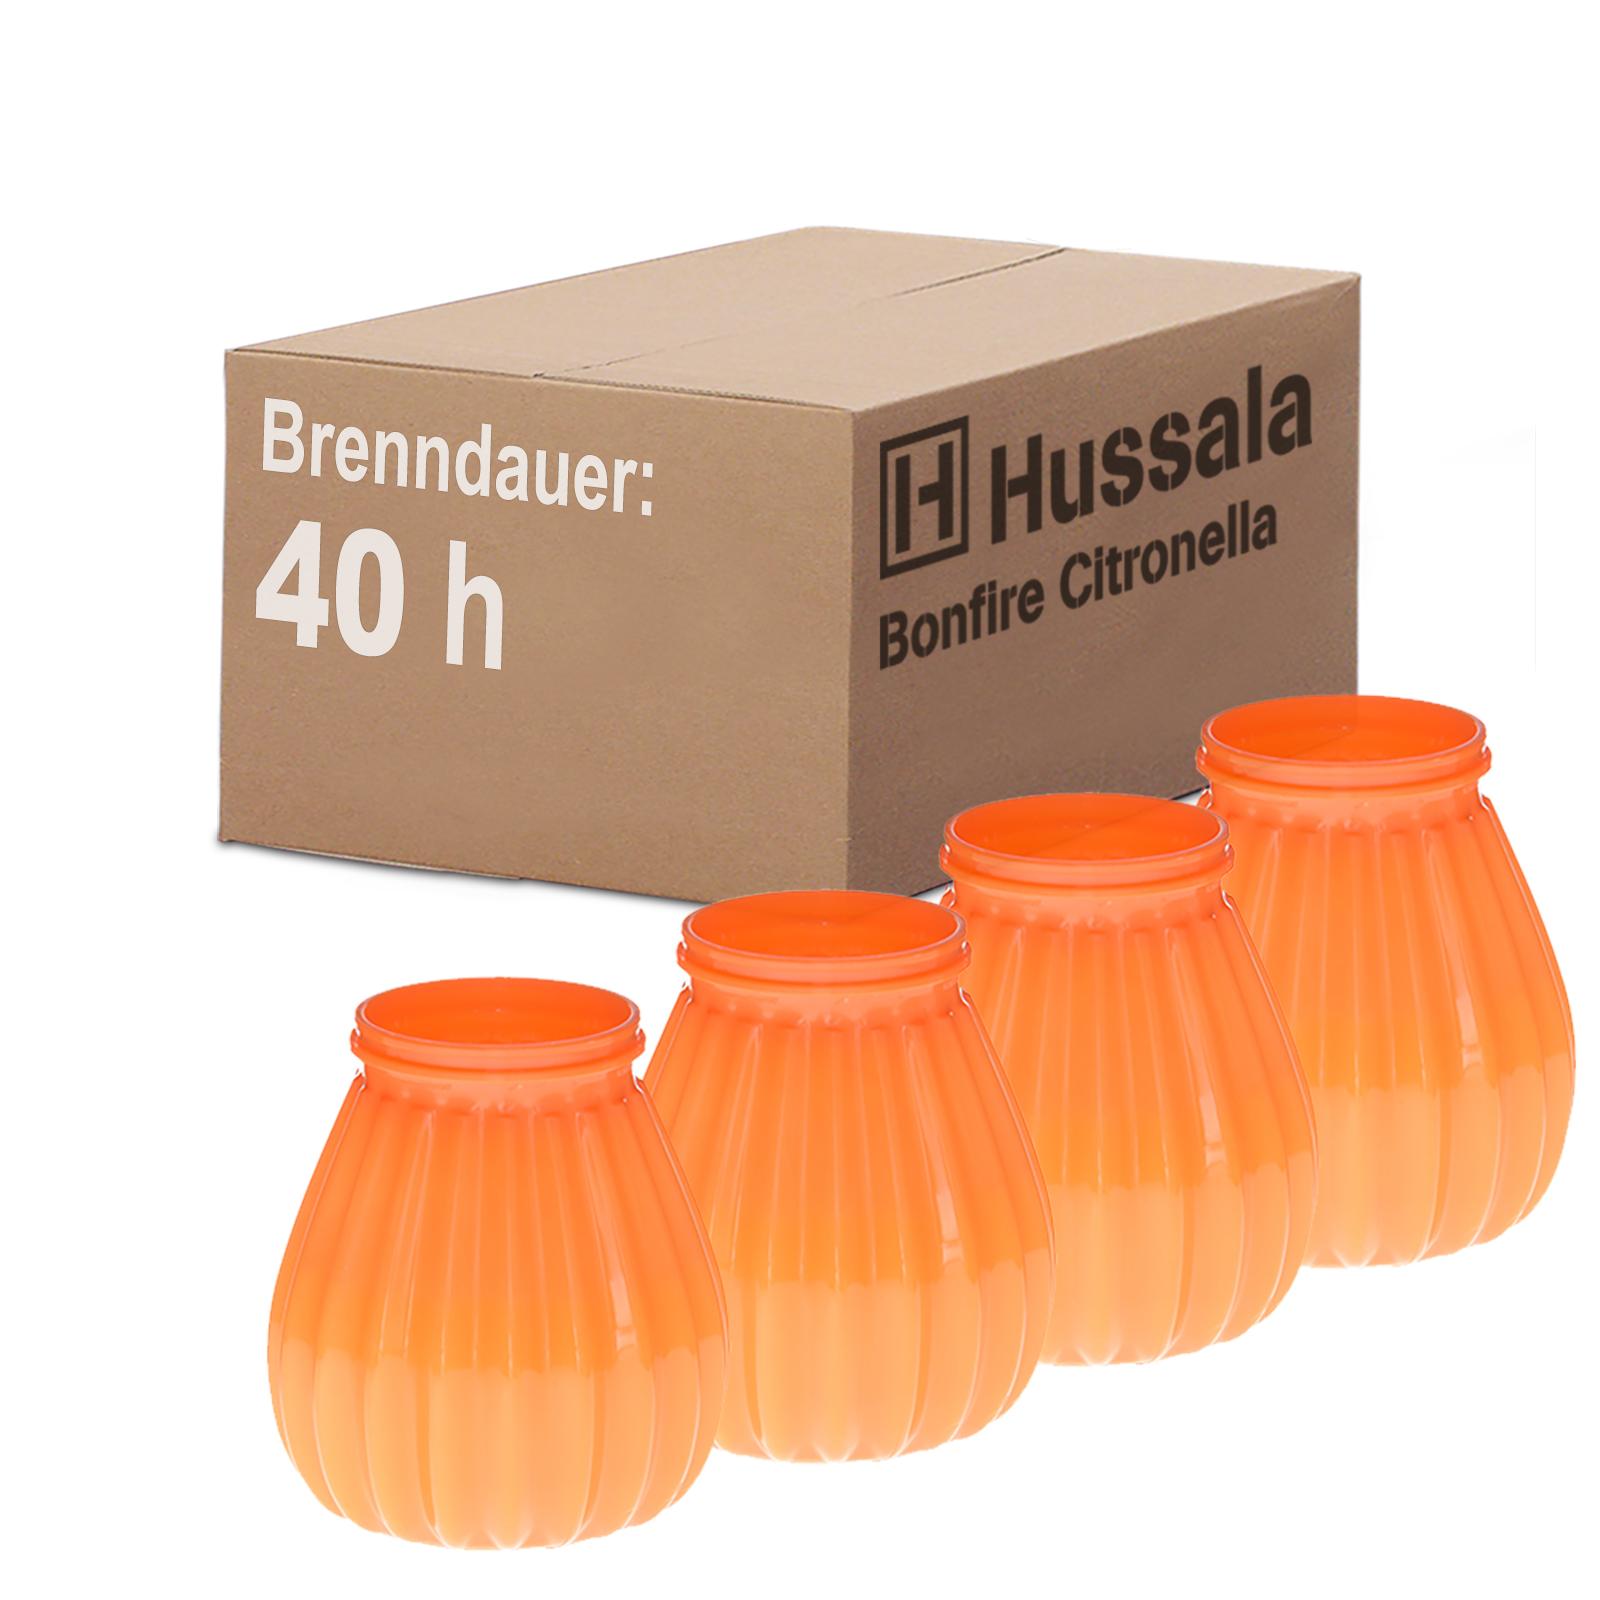 HUSSALA-Outdoorkerzen-Bonfire-Citronella-Brennzeit-40h-Duft-Garten-Kerzen-Glaeser